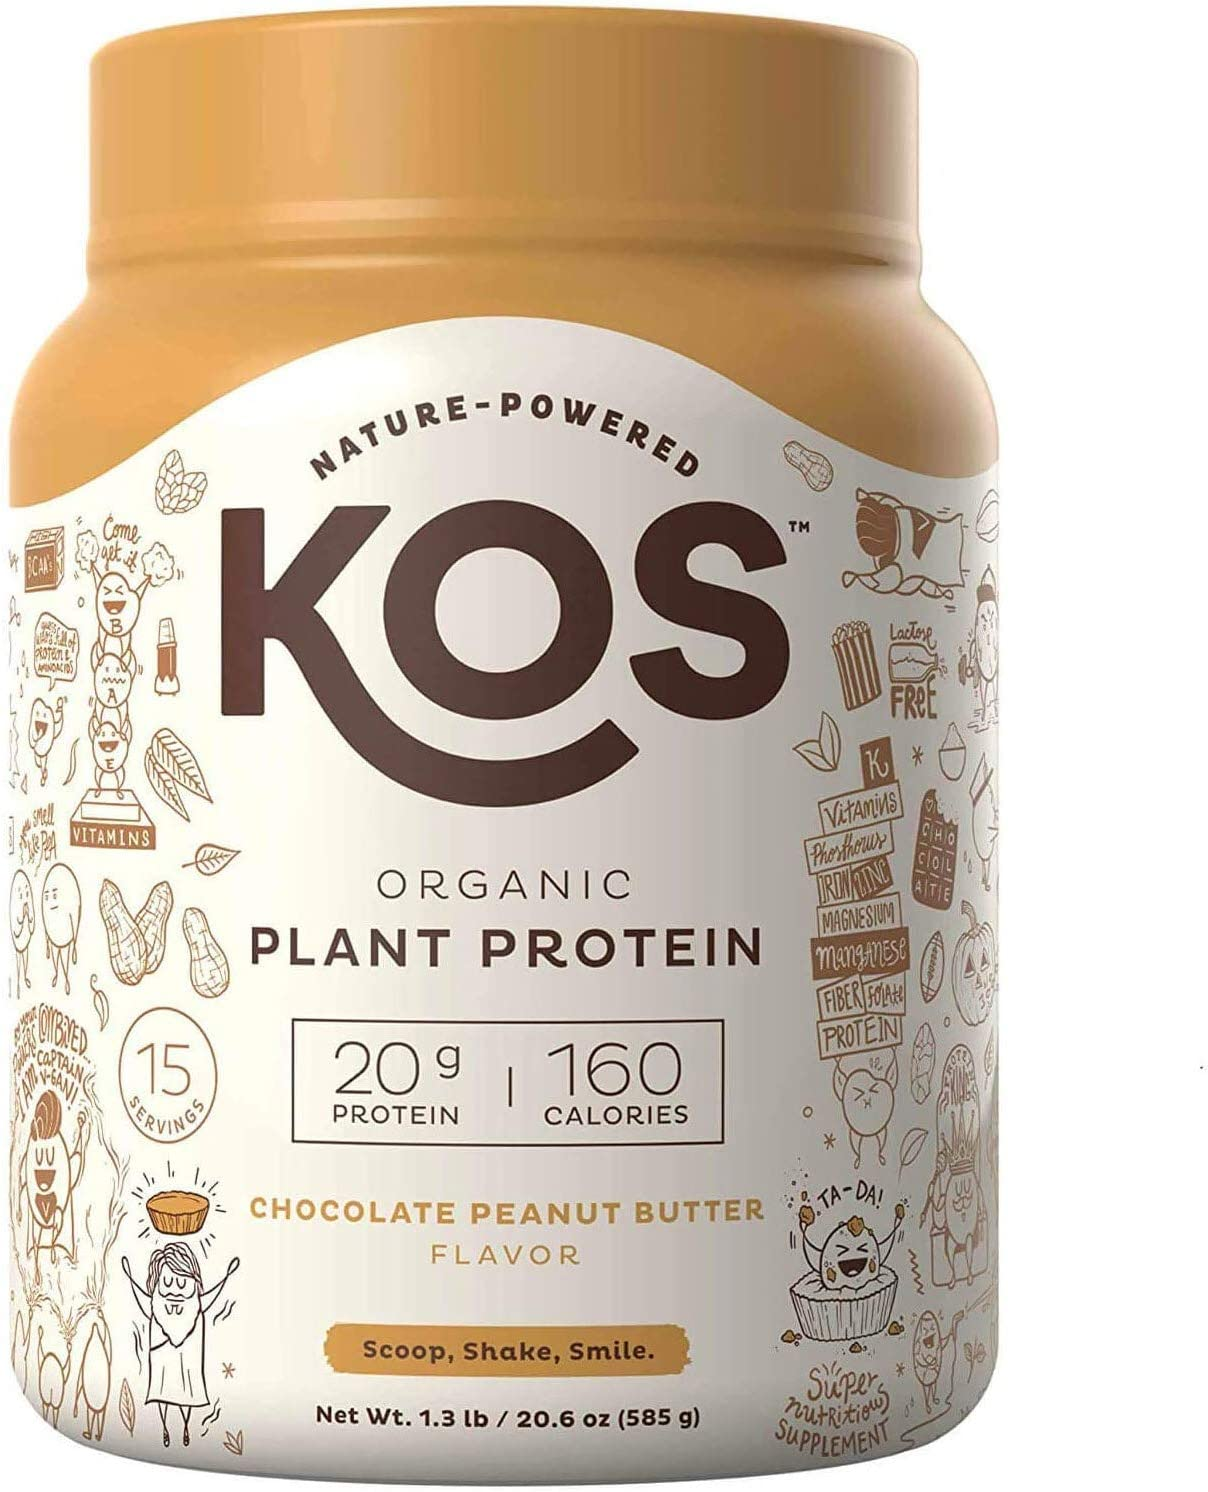 KOS Organic Plant Based Protein Powder – Raw Organic Vegan Protein Blend, 1.3 Pound, 15 Servings (Chocolate Peanut Butter)